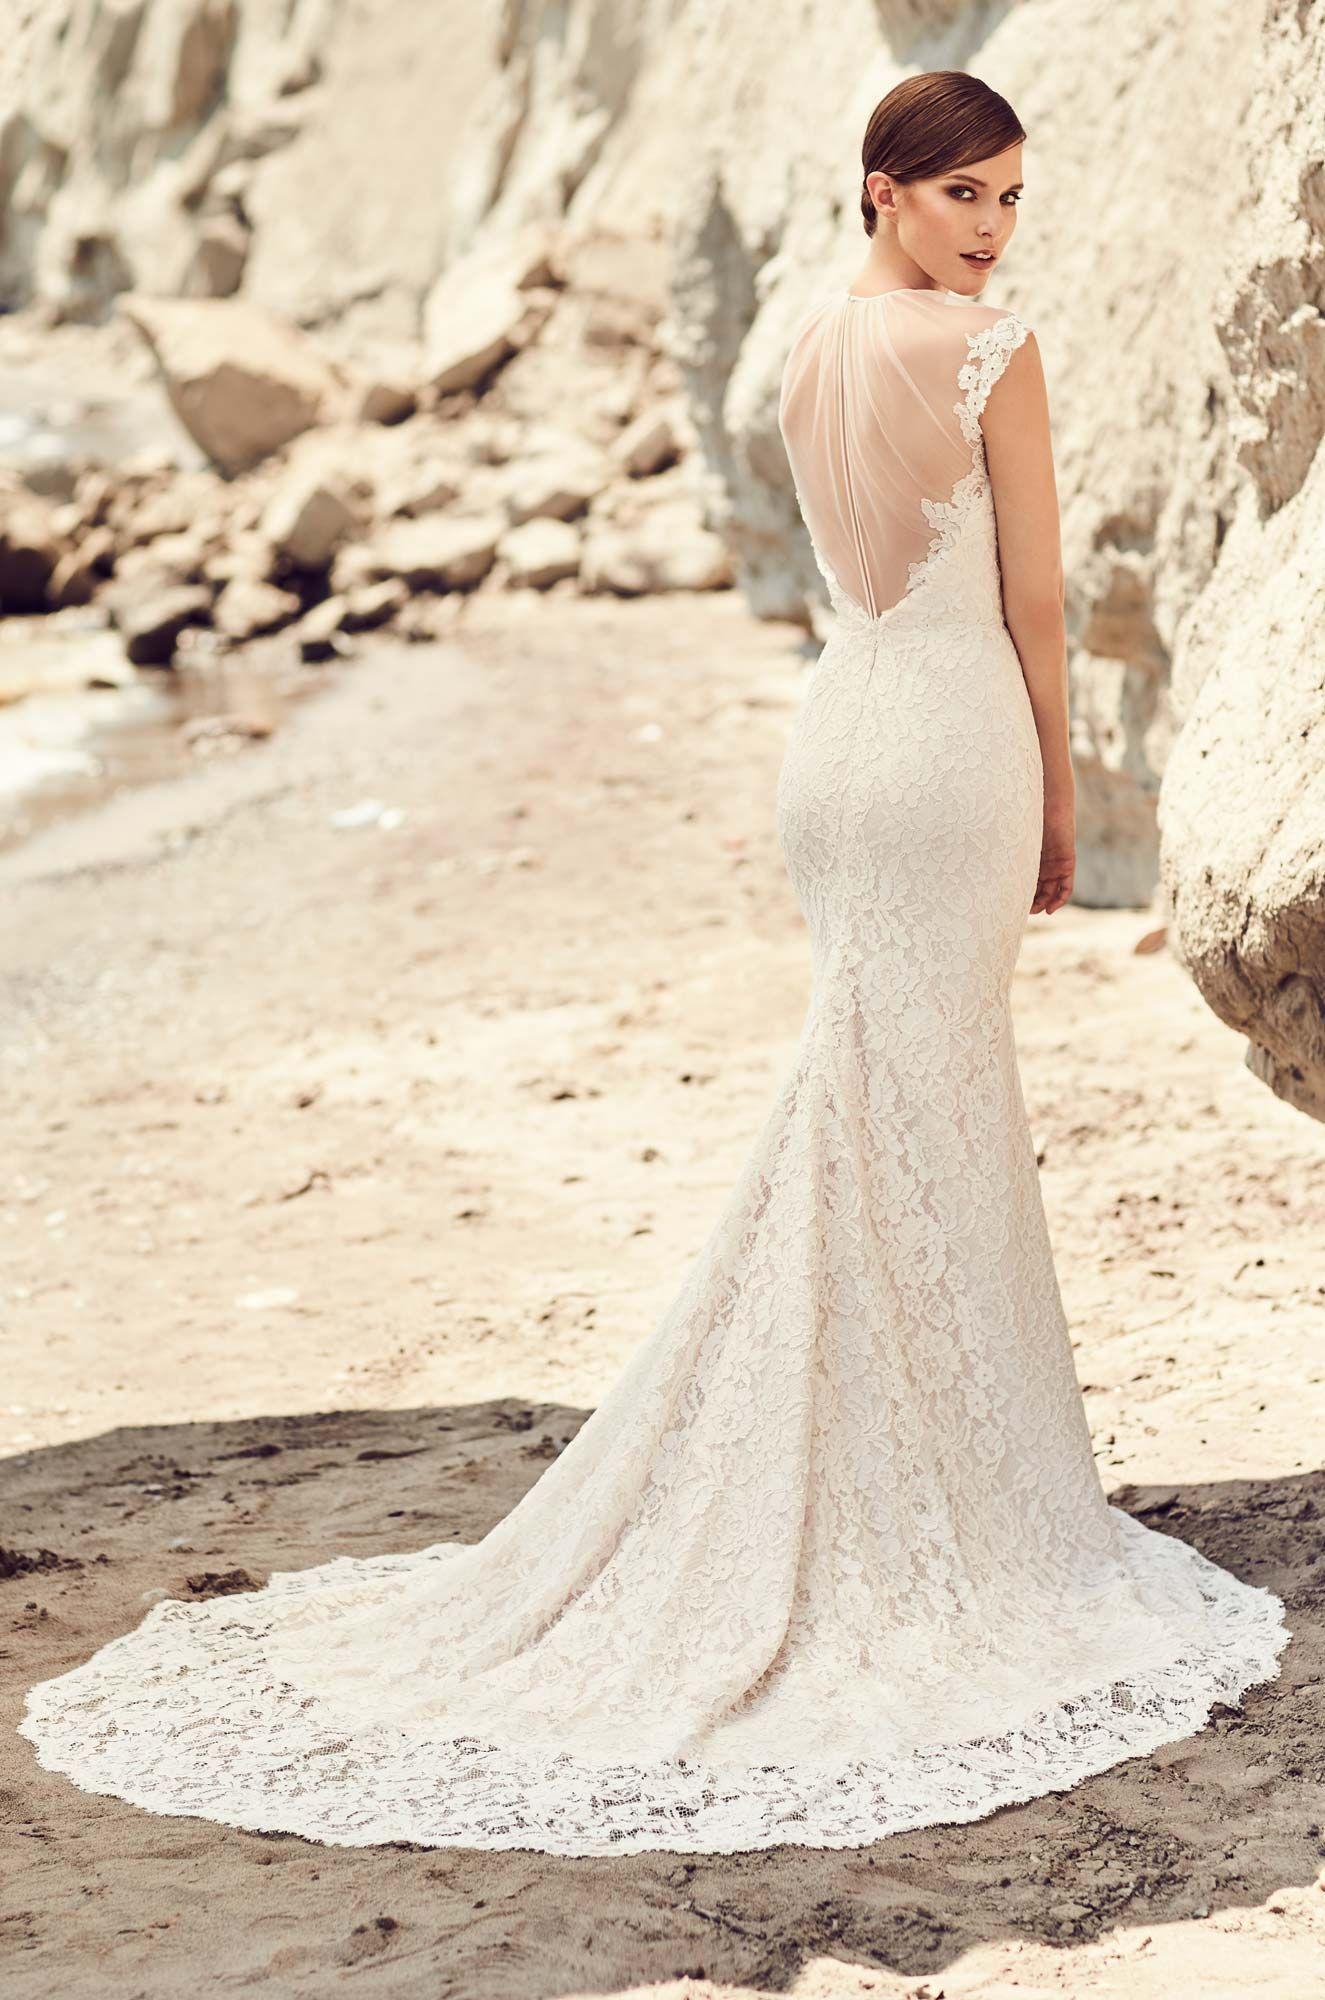 Illusion tulle neckline wedding dress style lace wedding